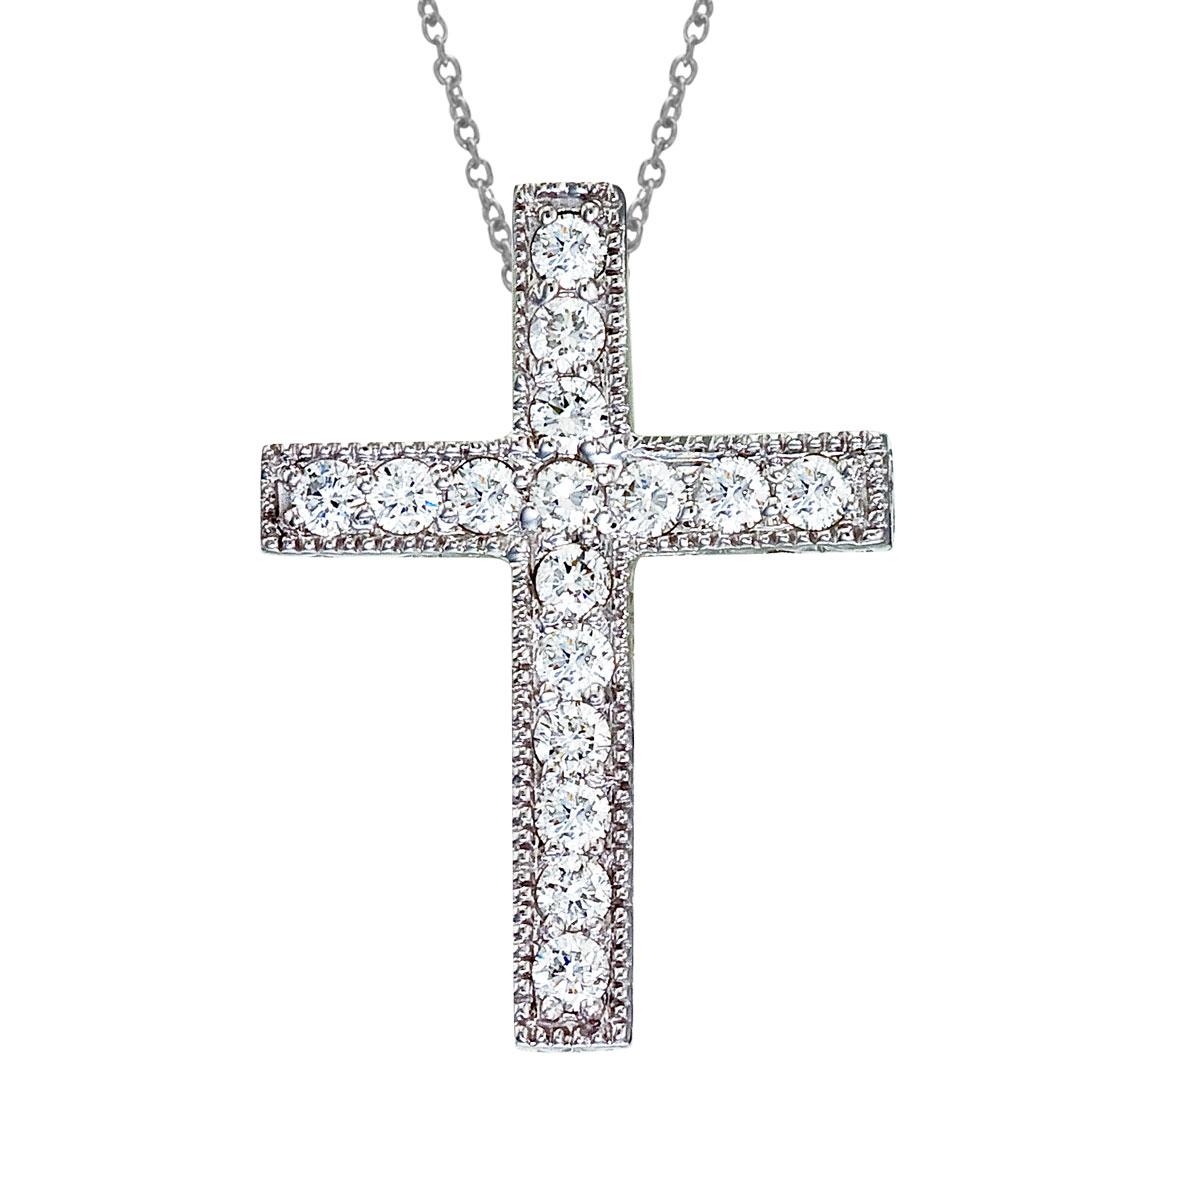 14K White Gold Large Scroll .50 Ct Diamond Cross Pendant